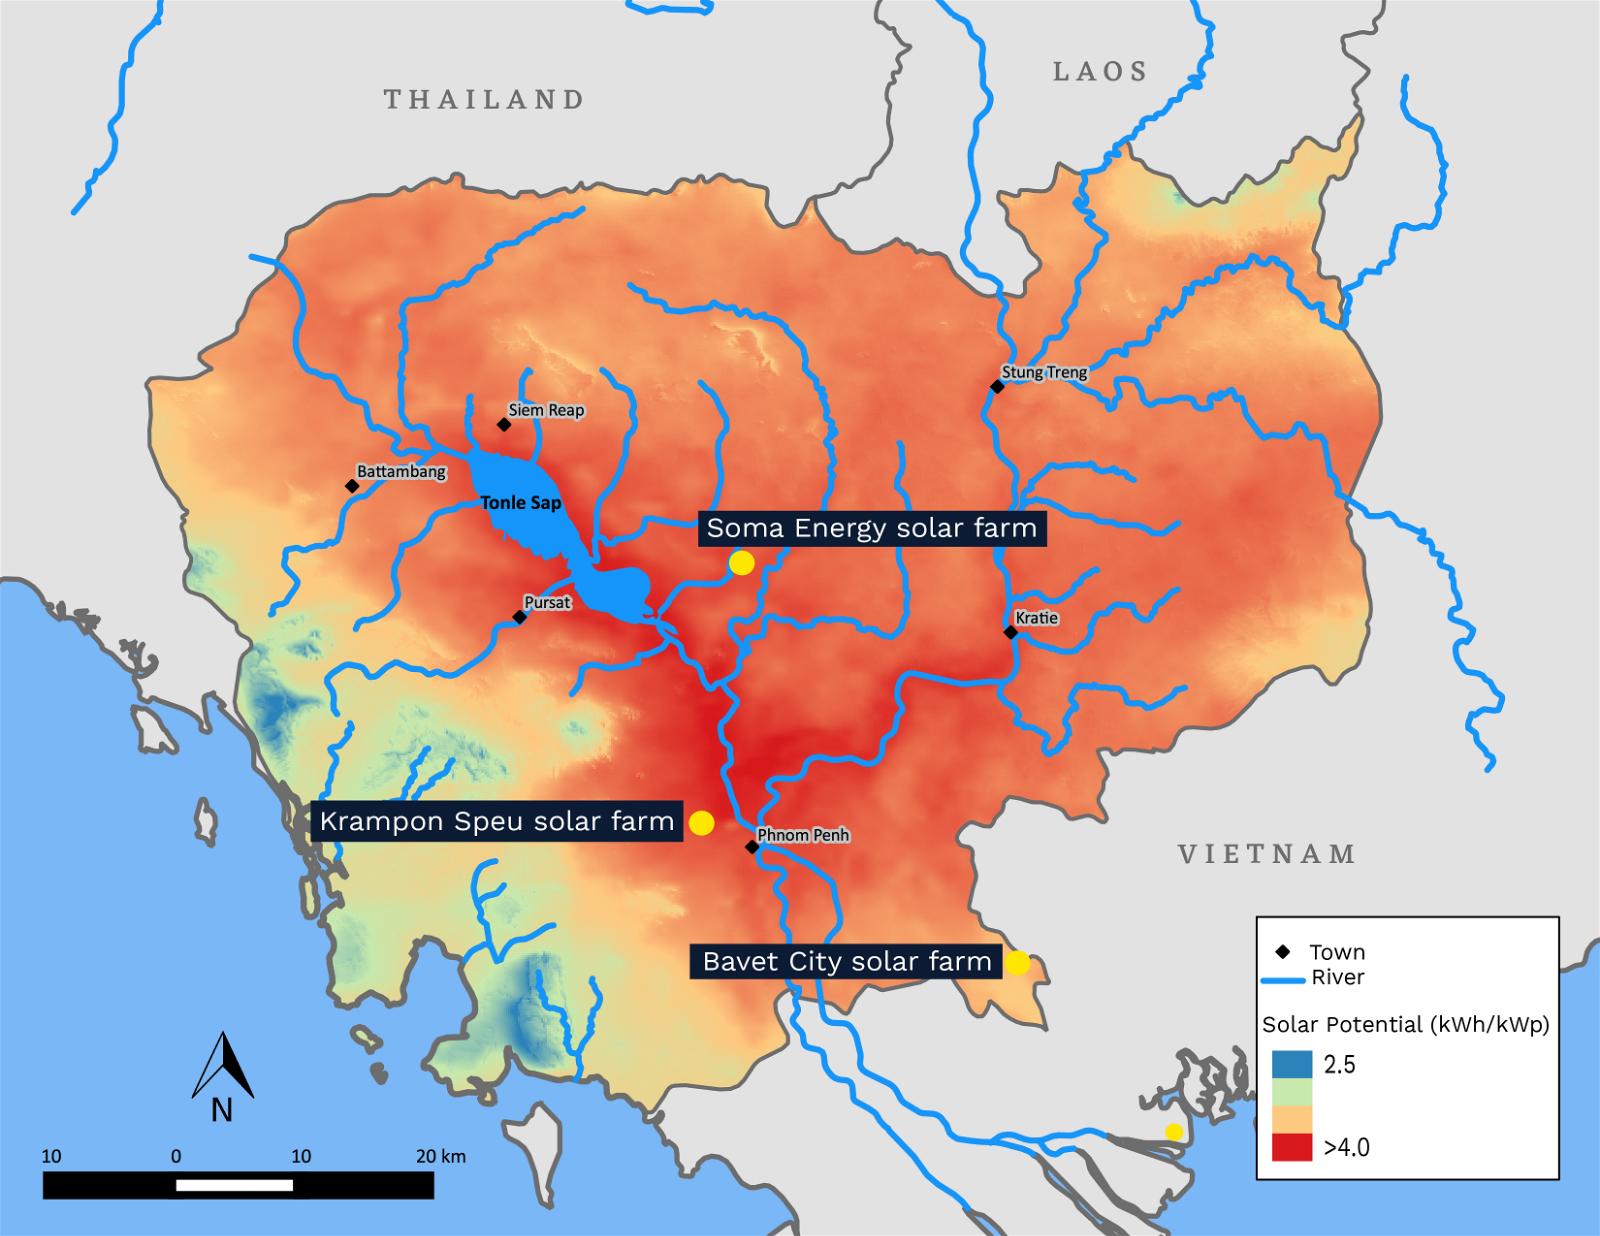 Cambodia's solar potential map